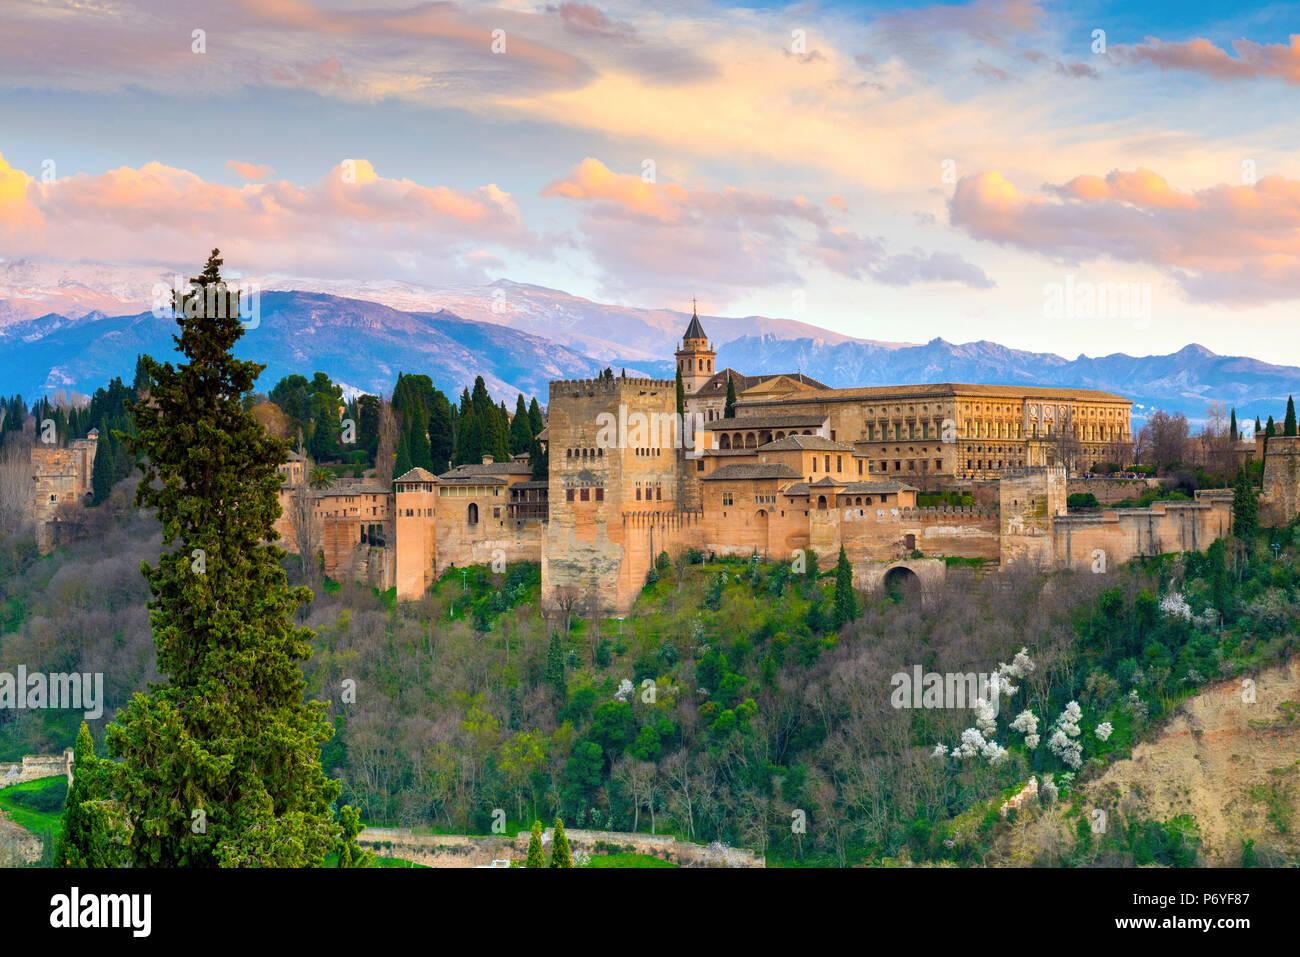 Spagna, Andalusia, Granada, Alhambra Palace Immagini Stock